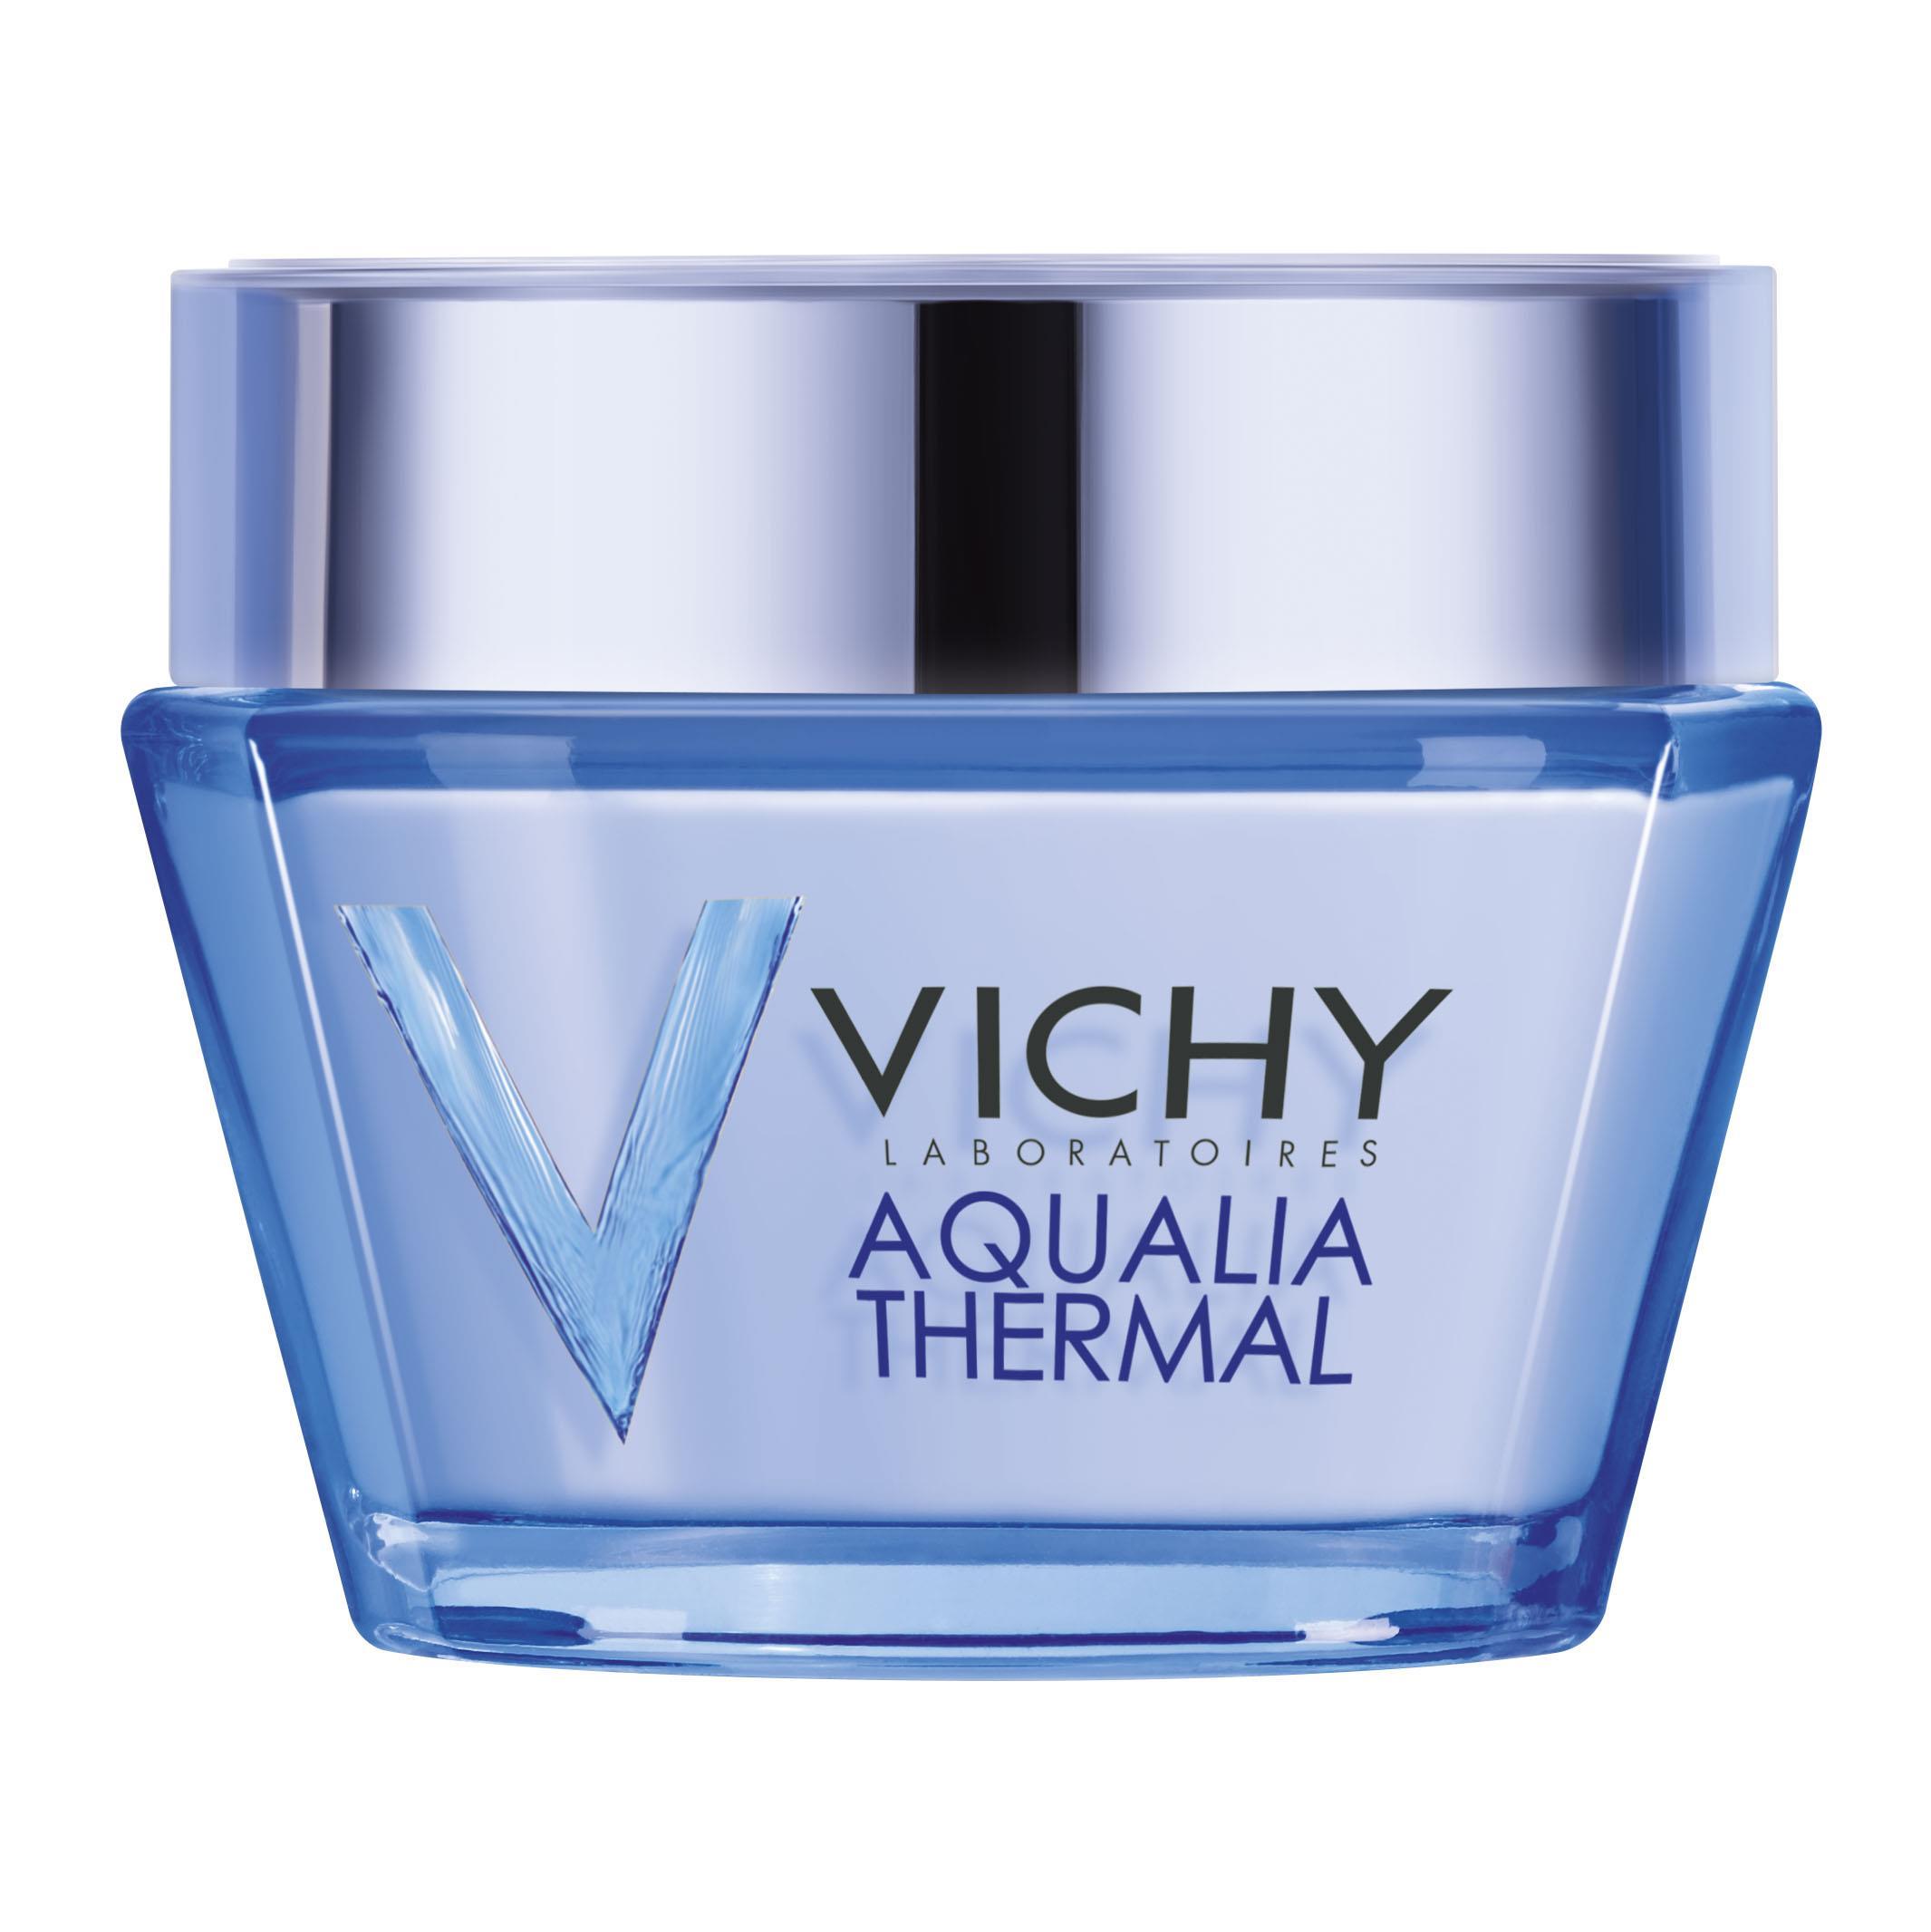 VICHY Aqualia Thermal leicht